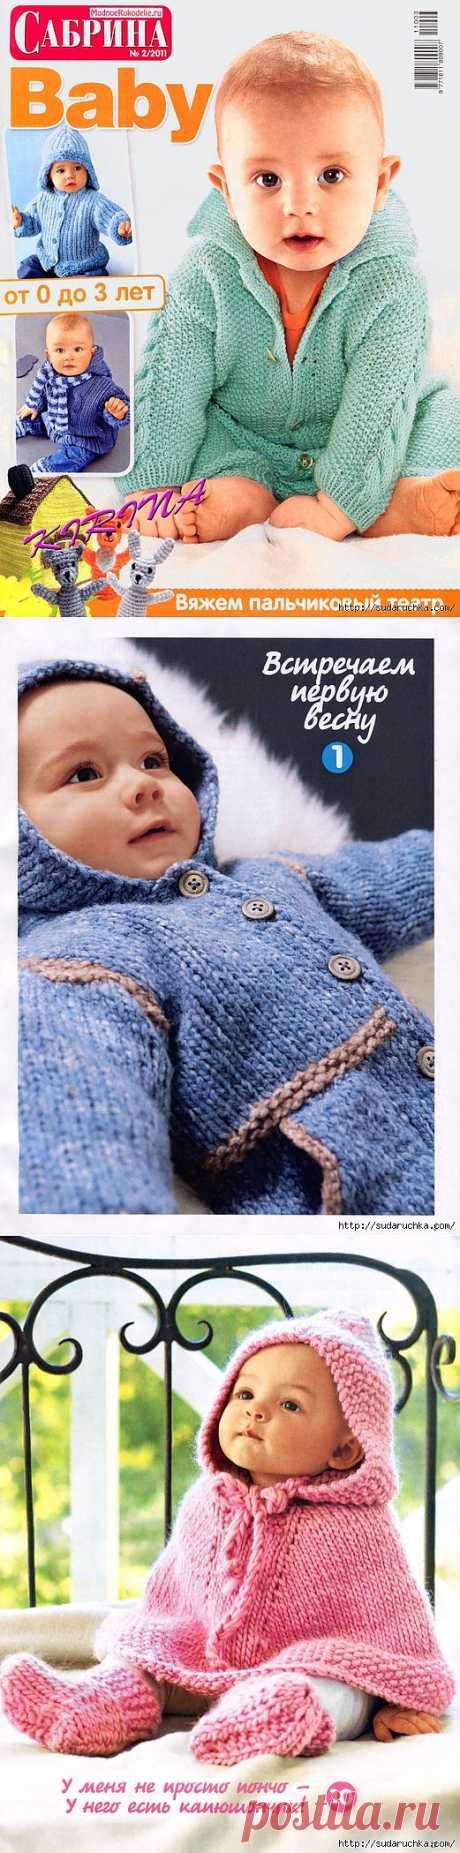 """Сабрина - Baby"". Журнал по вязанию."